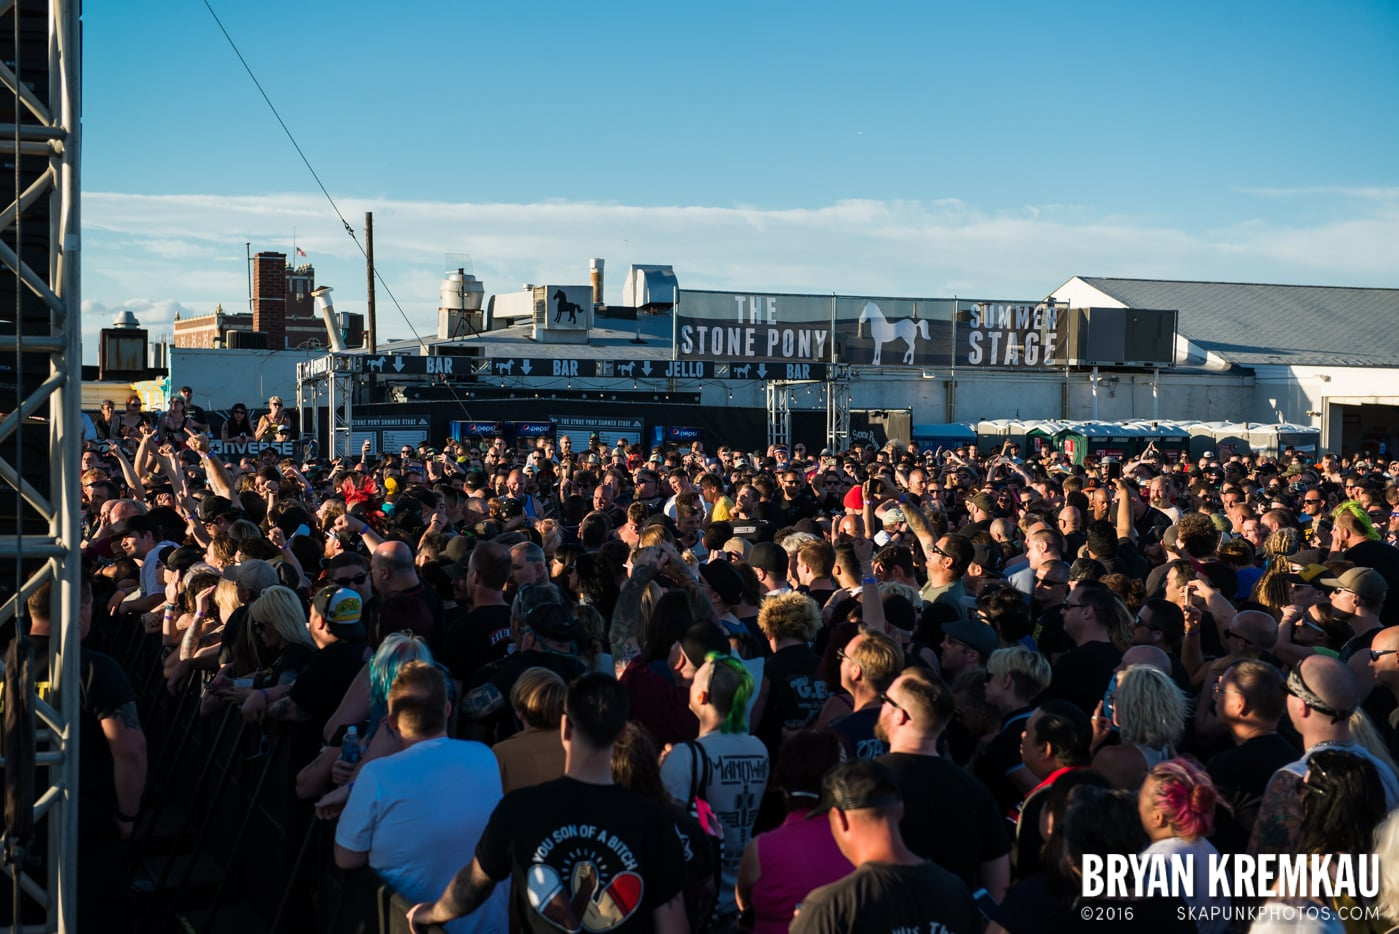 Agnostic Front @ Punk Rock Bowling, Stone Pony Summerstage, Asbury Park, NJ - 6.12.16 (1)